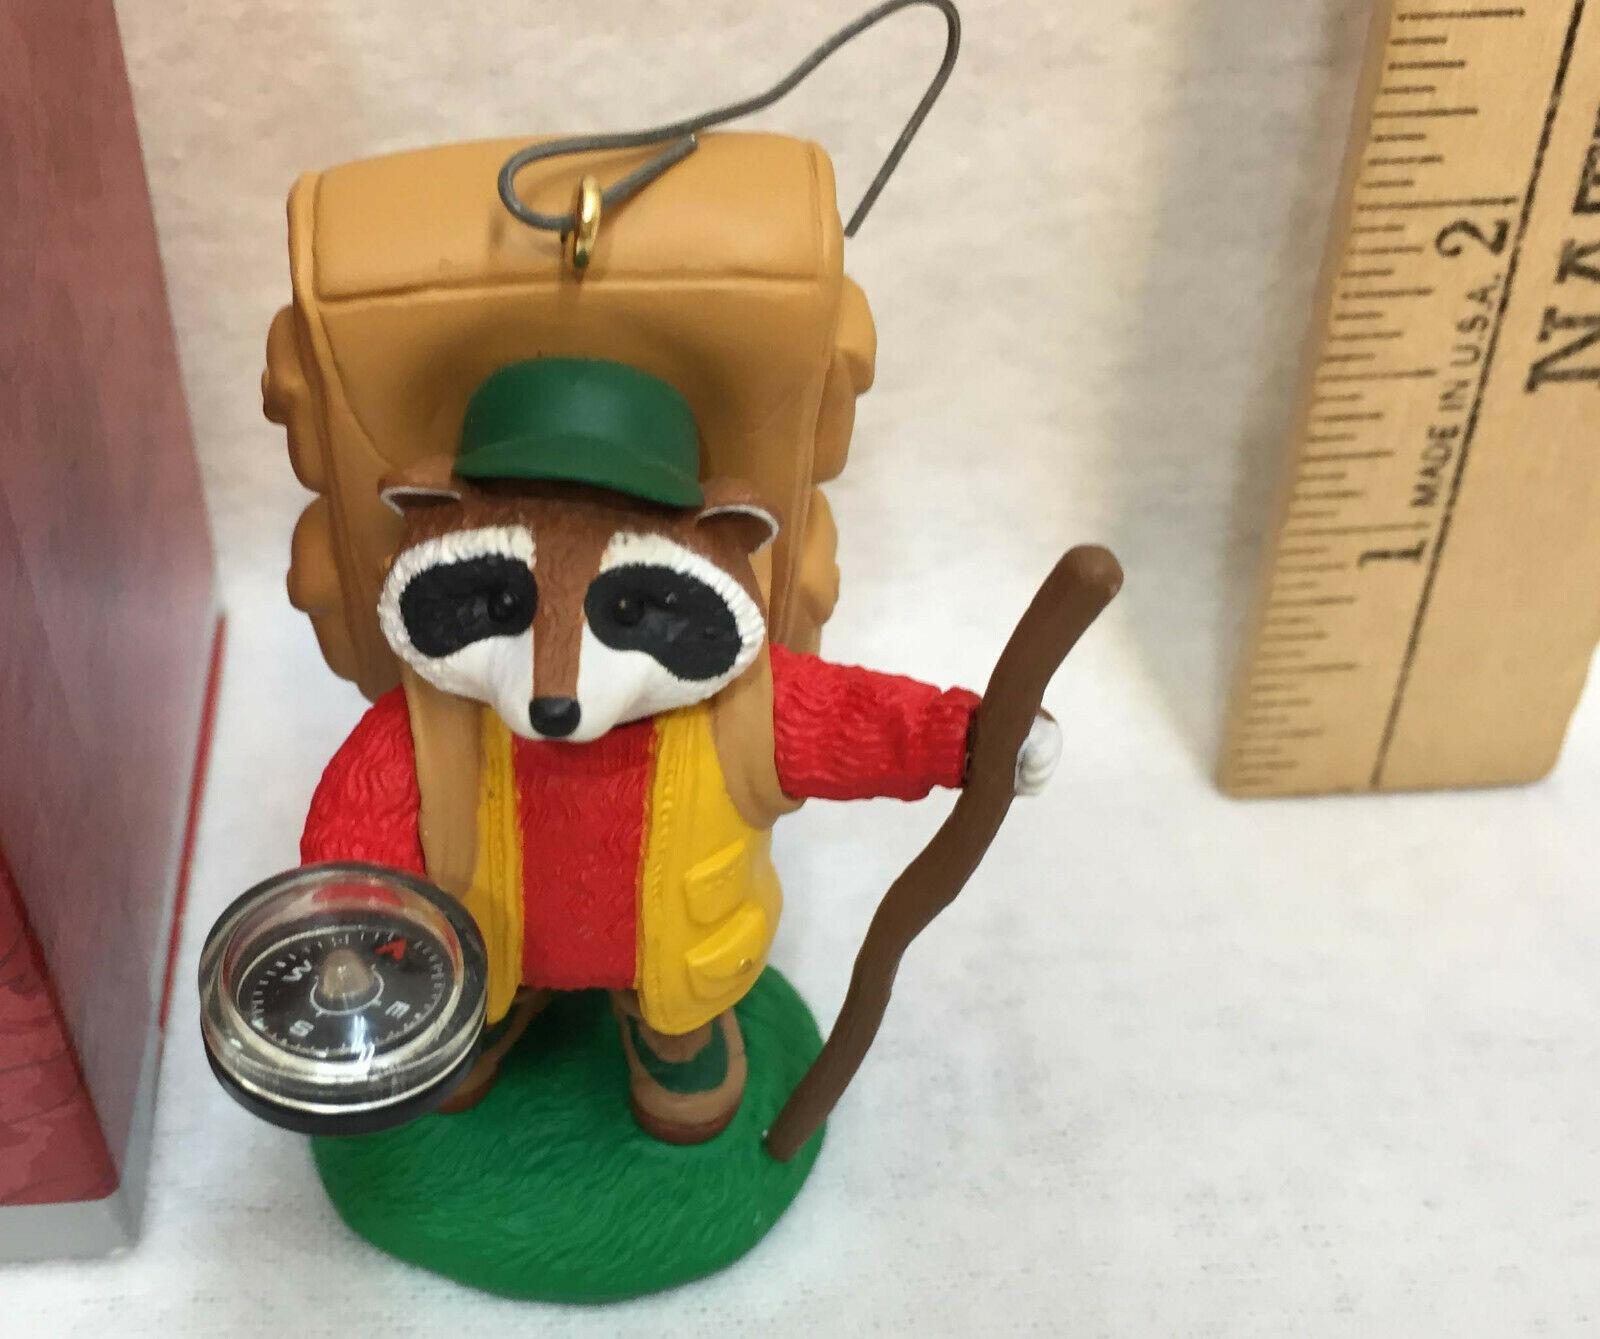 Holiday Camper Hallmark Keepsake Ornament Hiker Raccoon Figure 1998 Compass